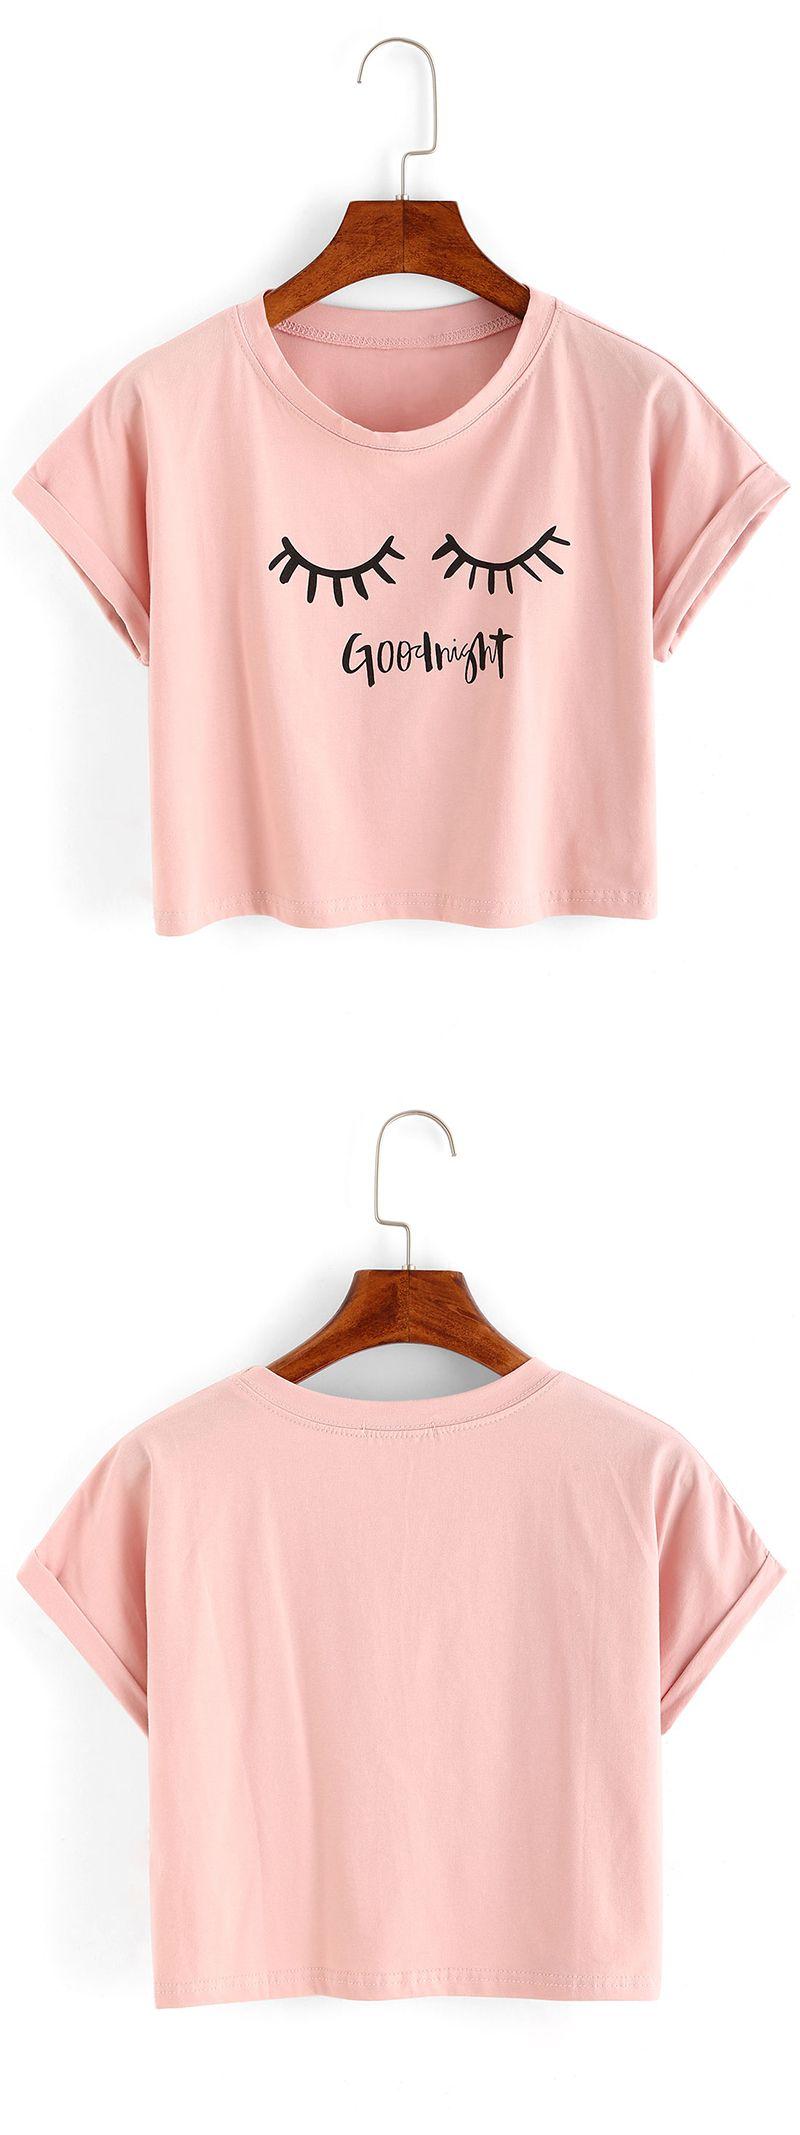 cute summer topseyelash print crop tshirt organza